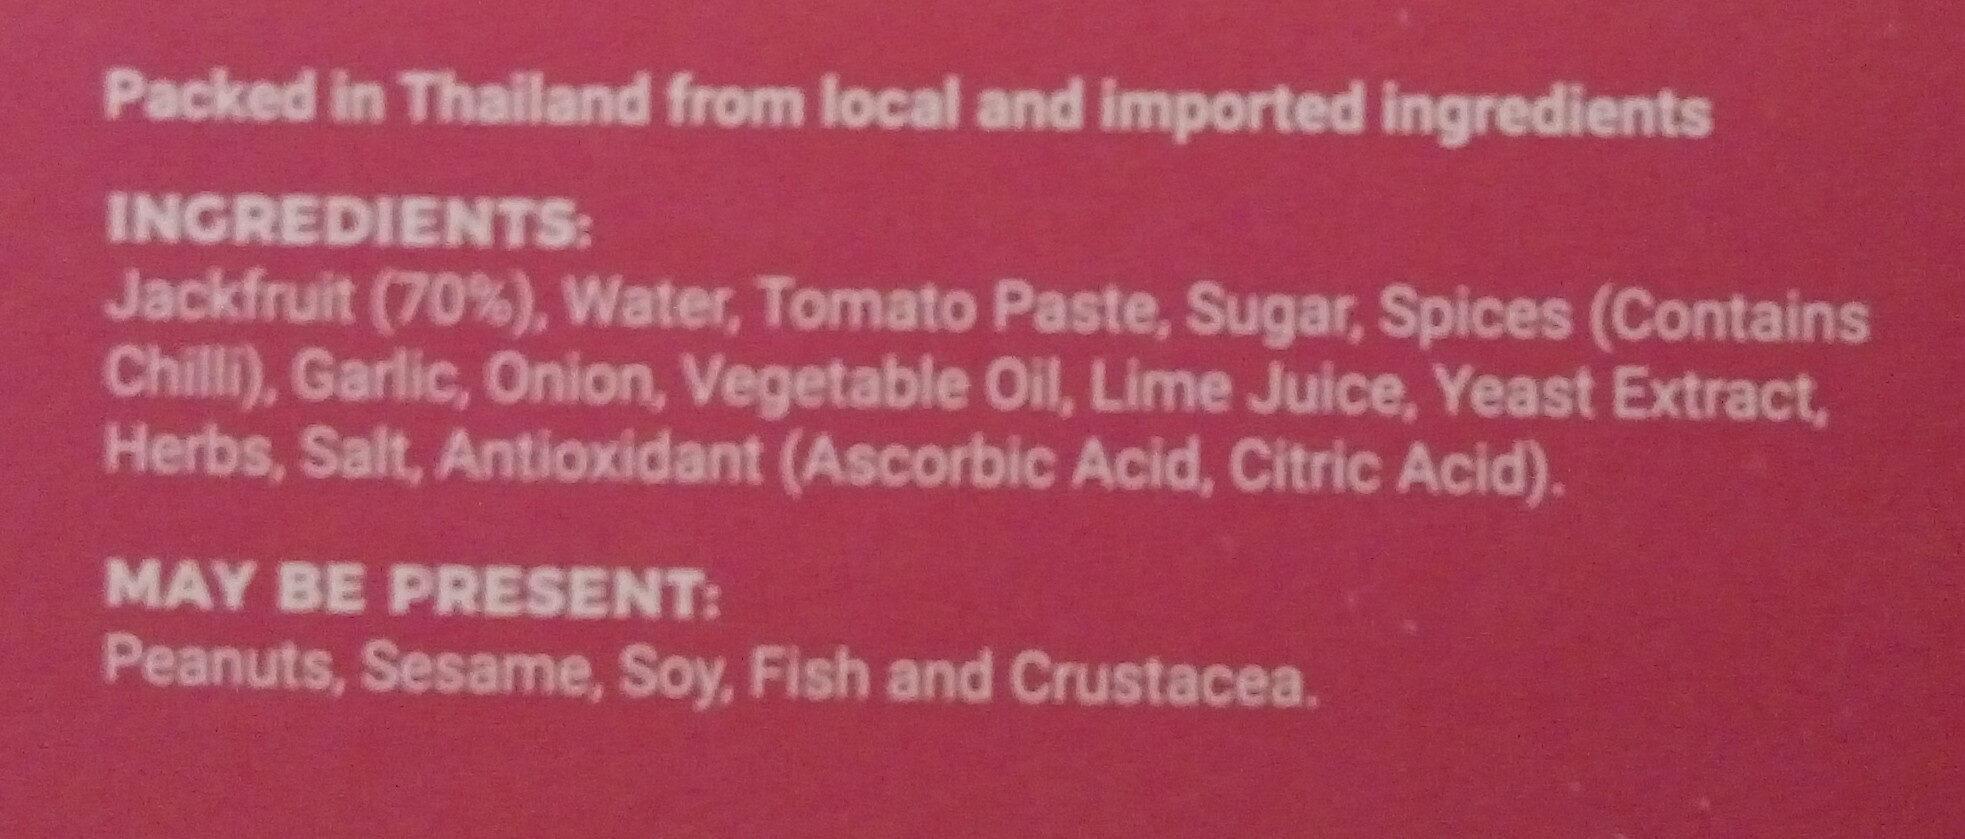 Jackfruit Tex Mex - Ingredients - en